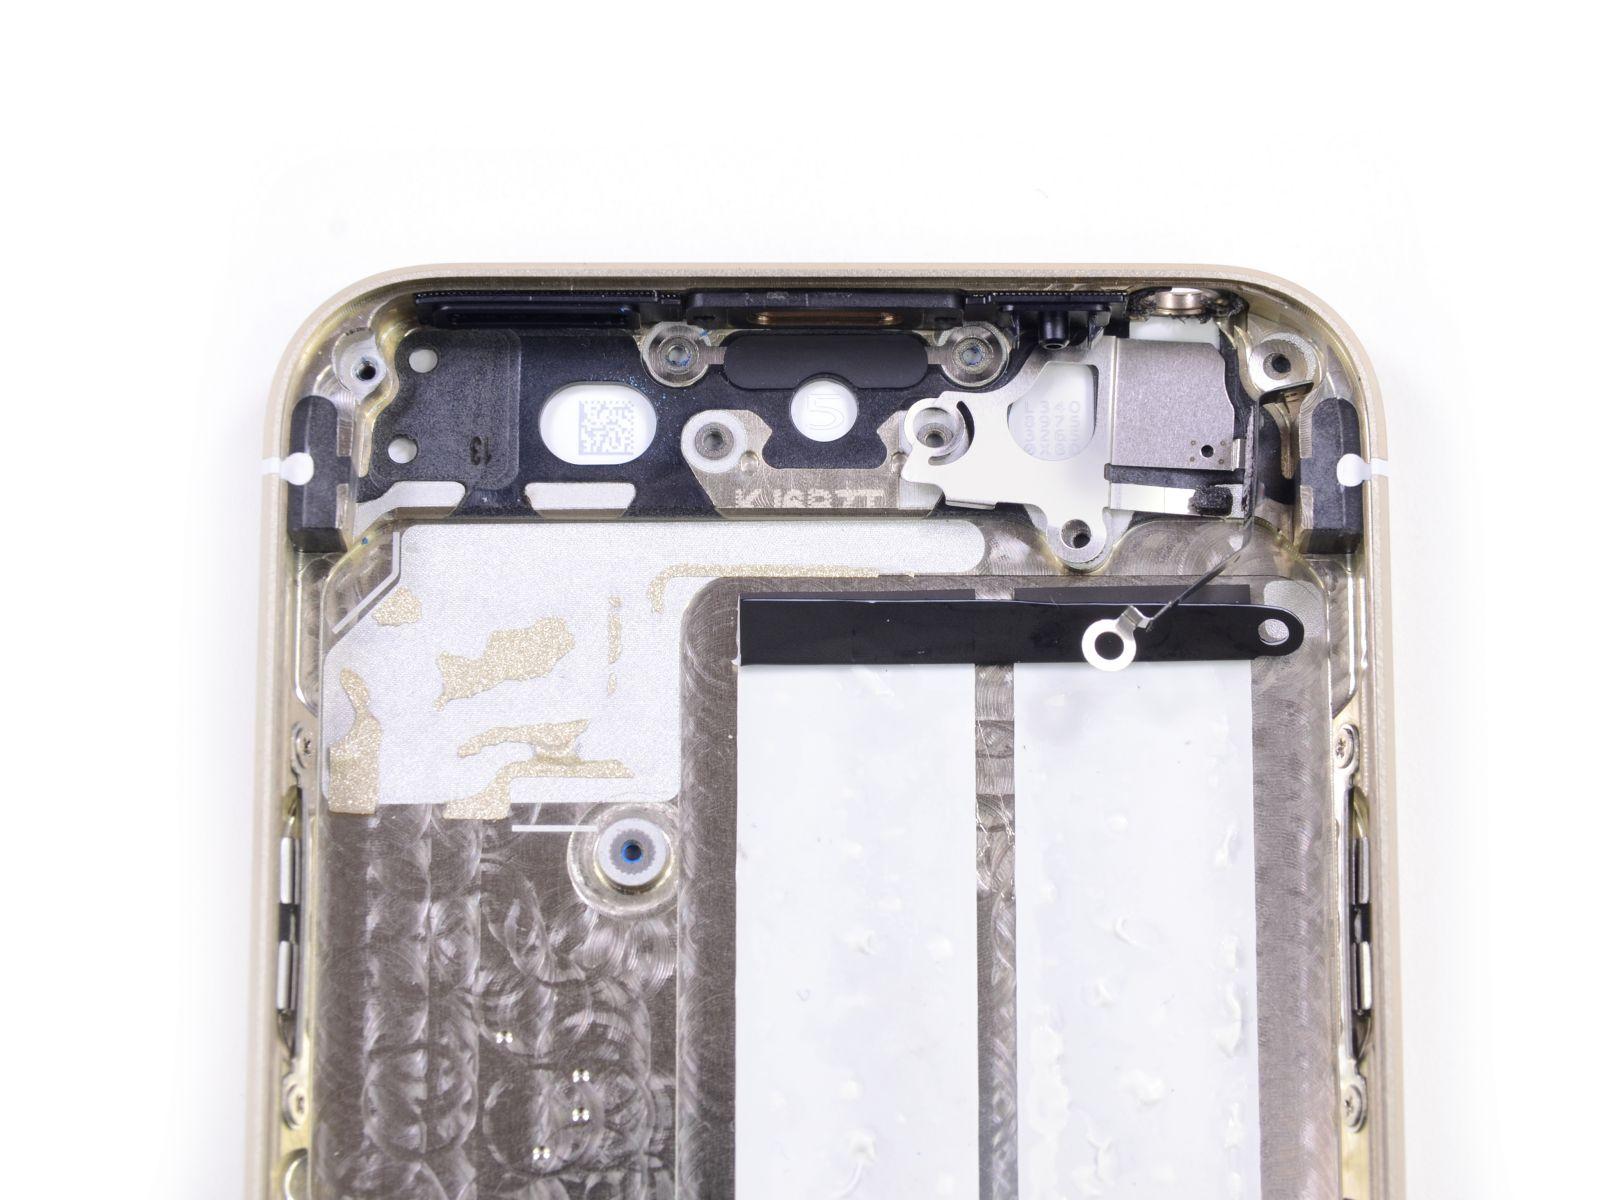 kak-razobrat-iphone-5s-44